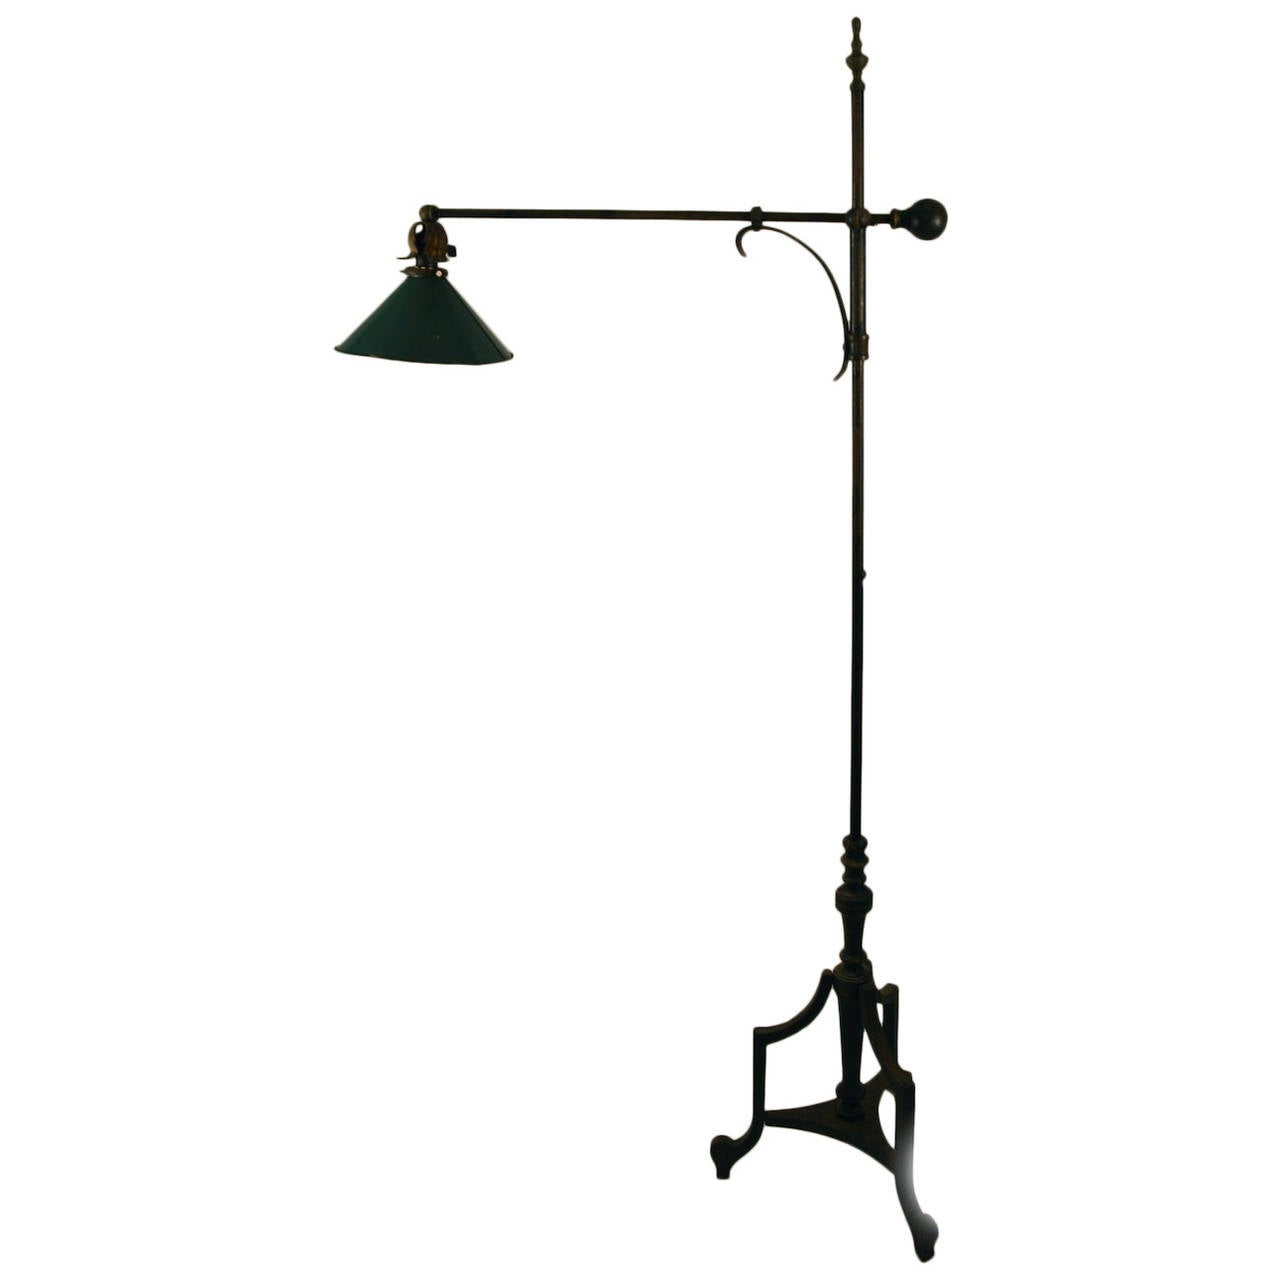 Rare Iron Counterbalance Adjustable Floor Lamp